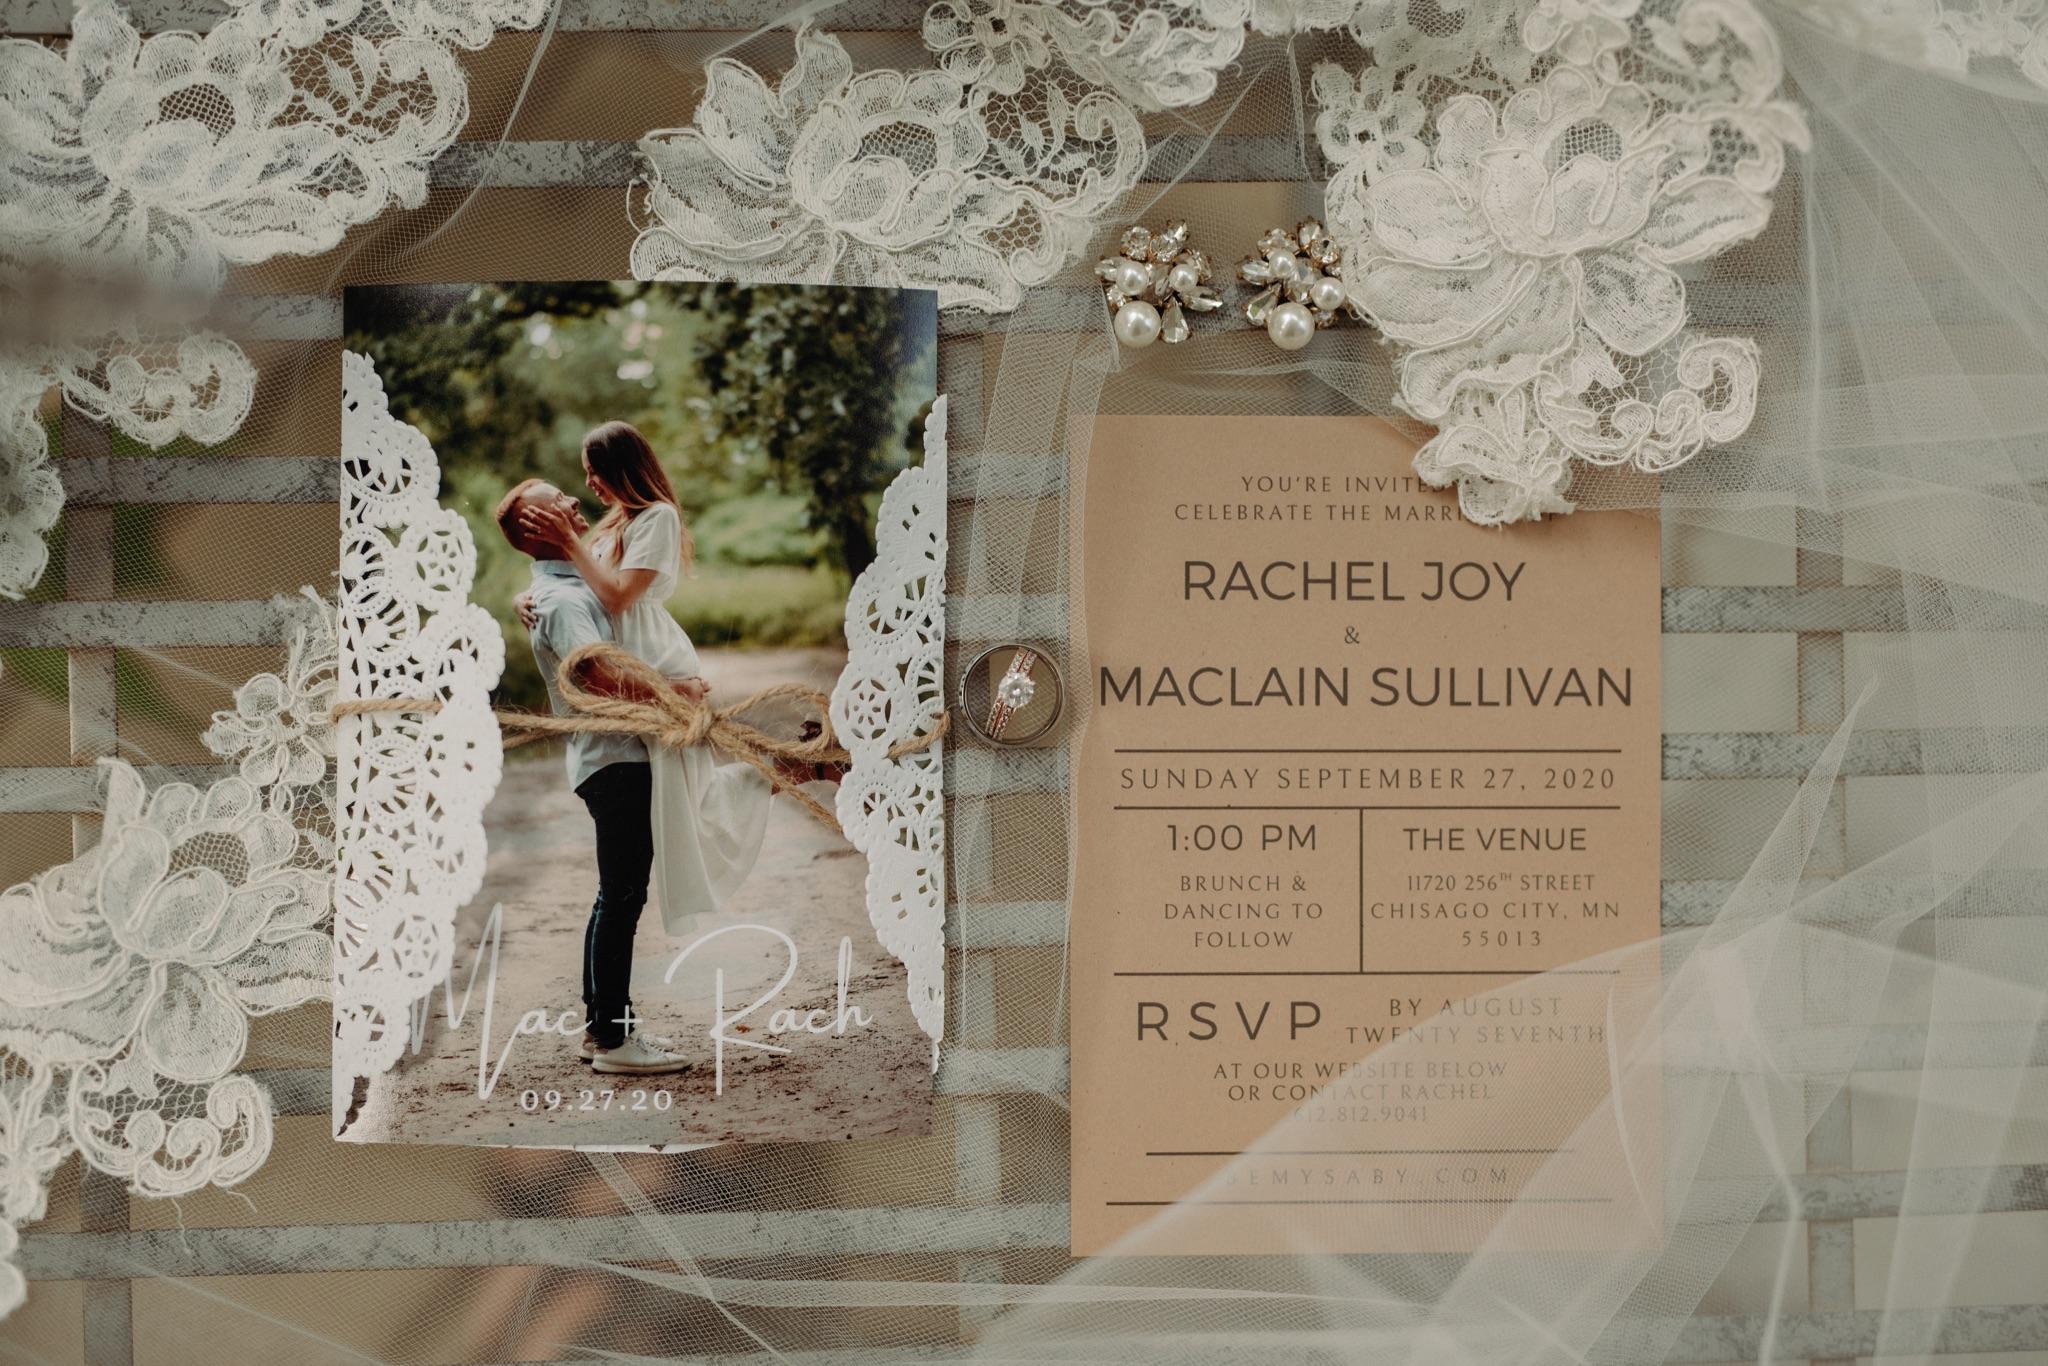 wedding invitation and wedding jewelry on lace background